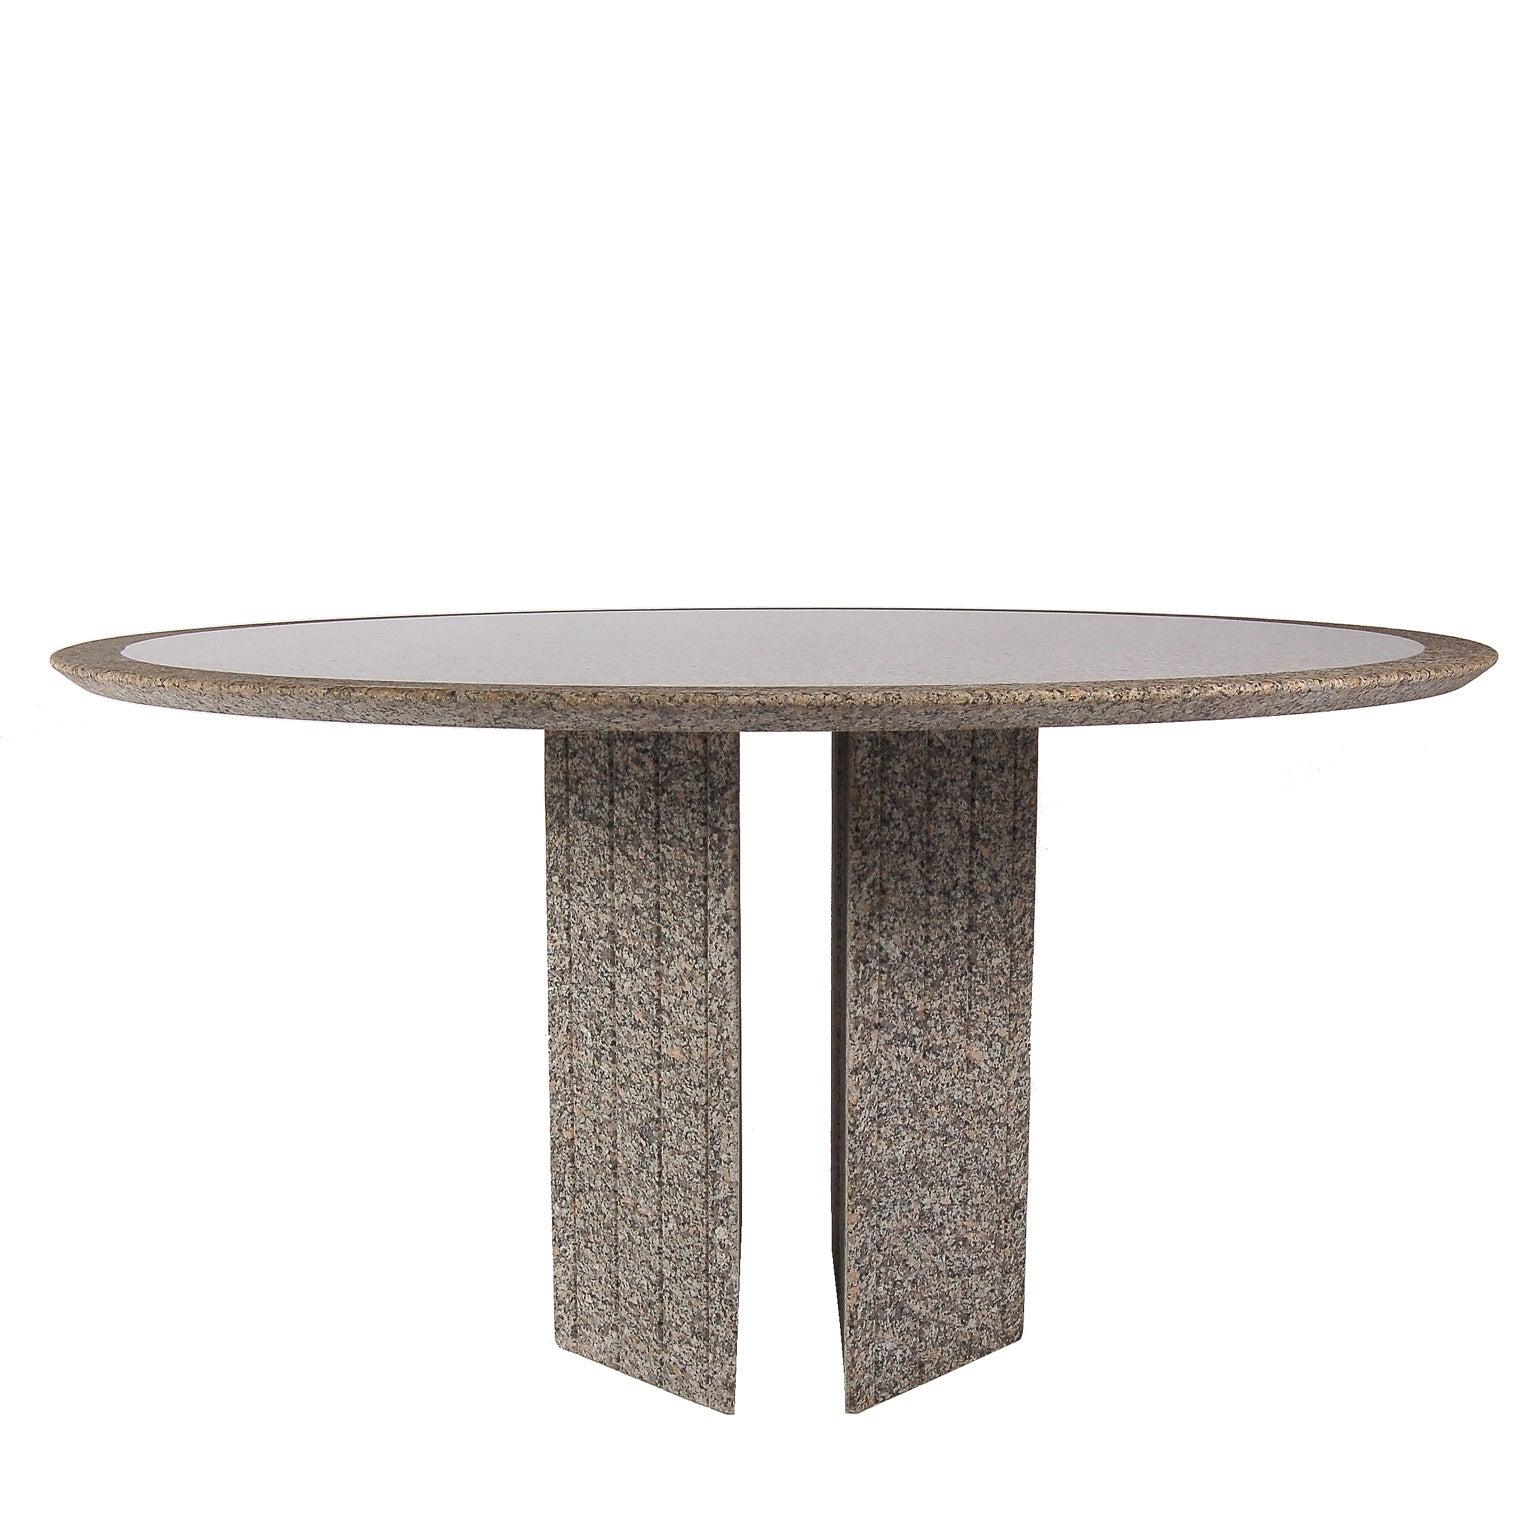 Mega Dining Table by Enrico Baleri for Knoll